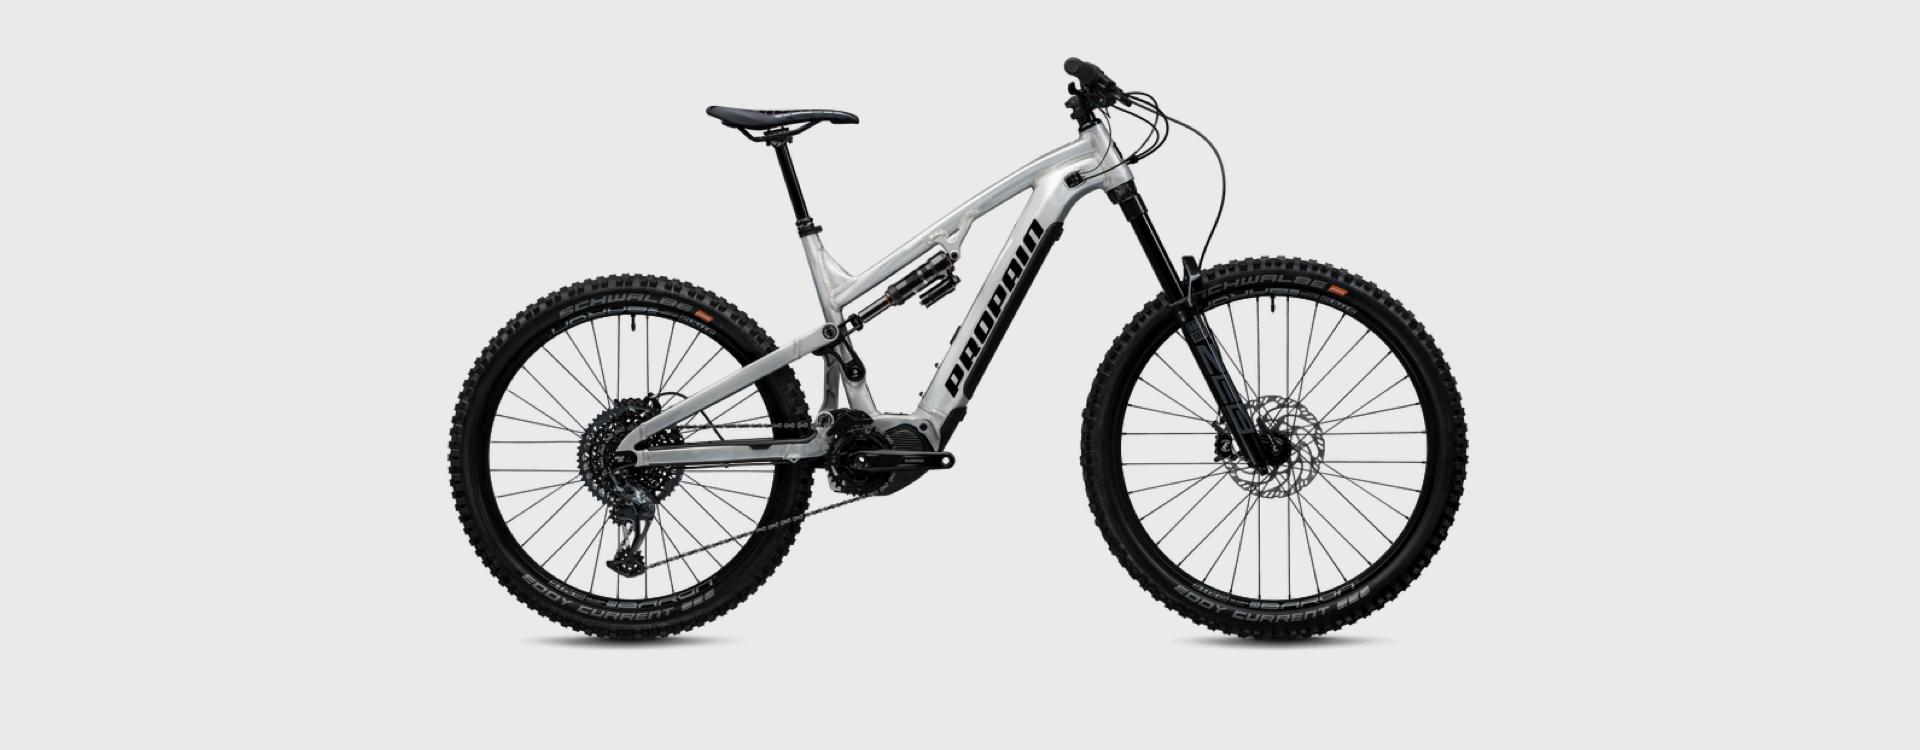 Bike Verleih Gummersbach Propain Bikes Testcenter NRW Ekano 2 - AL - S - Mix - Raw - 1920x750